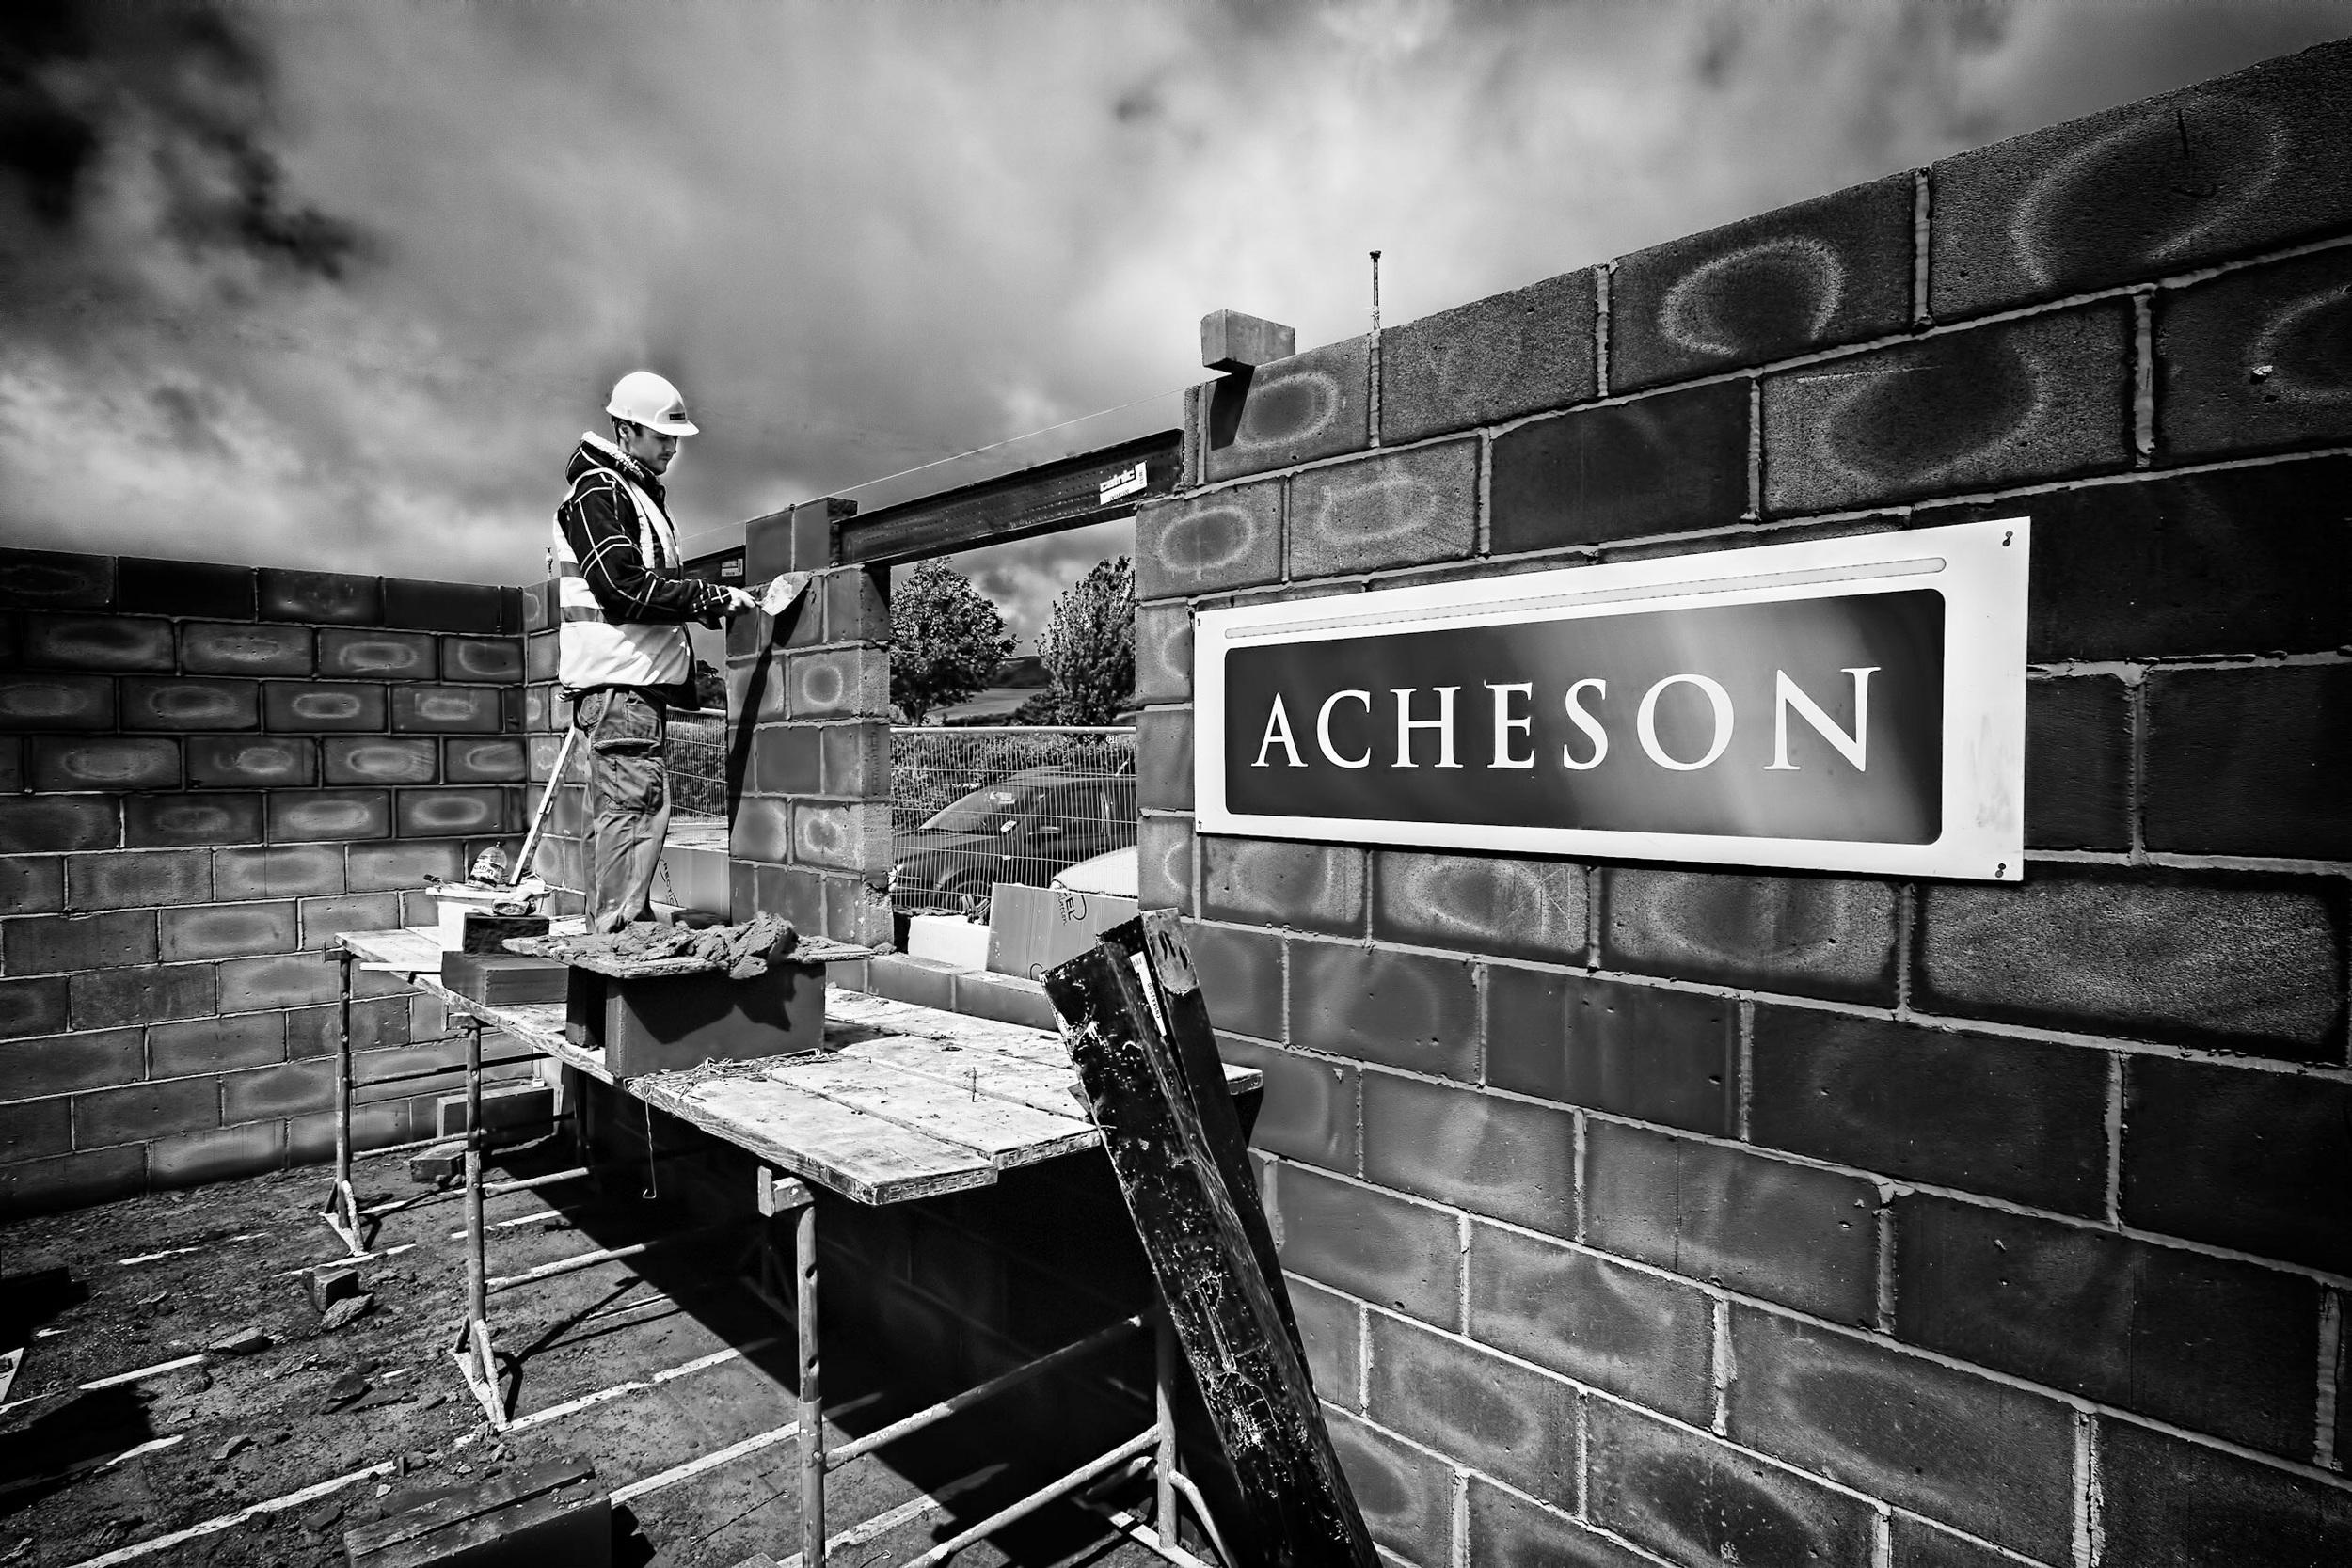 Catnic Lintol construction photography product shoot image, Corfe Castle, Dorset